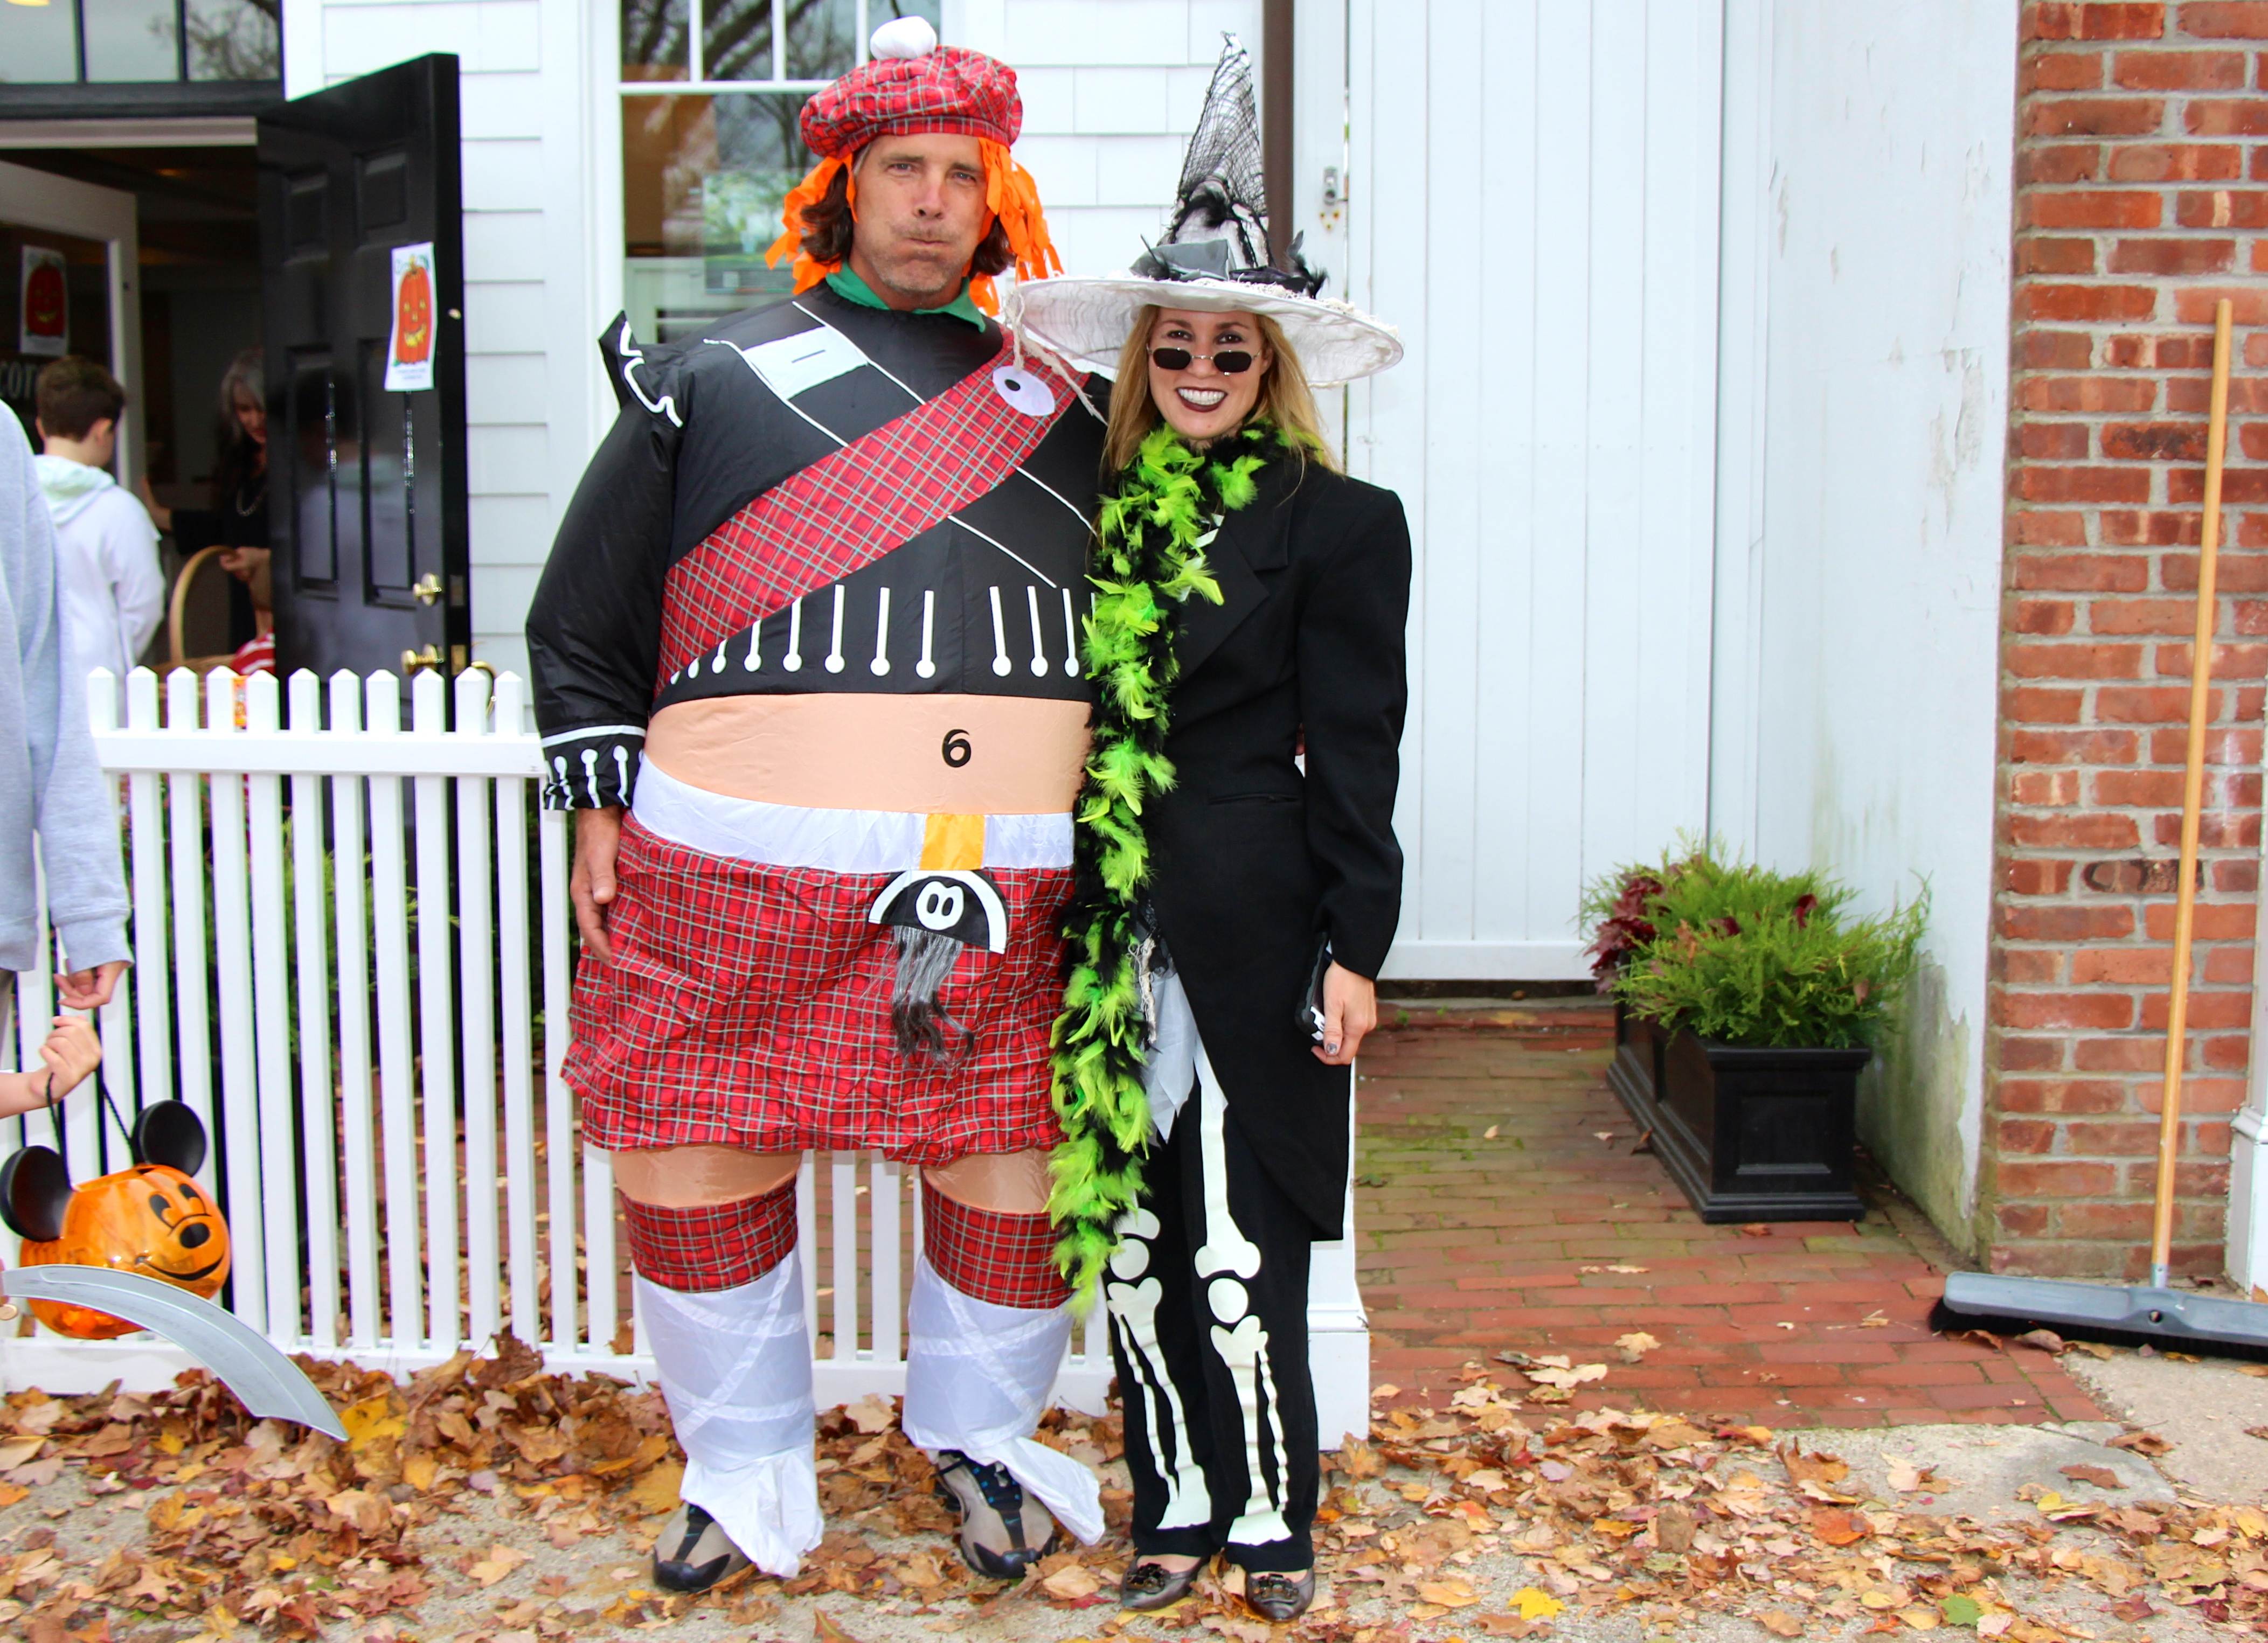 James ...  sc 1 st  KDH&tons & Sag Harboru0027s Page Restaurant Hosts Halloween Costume Bash - KDHamptons